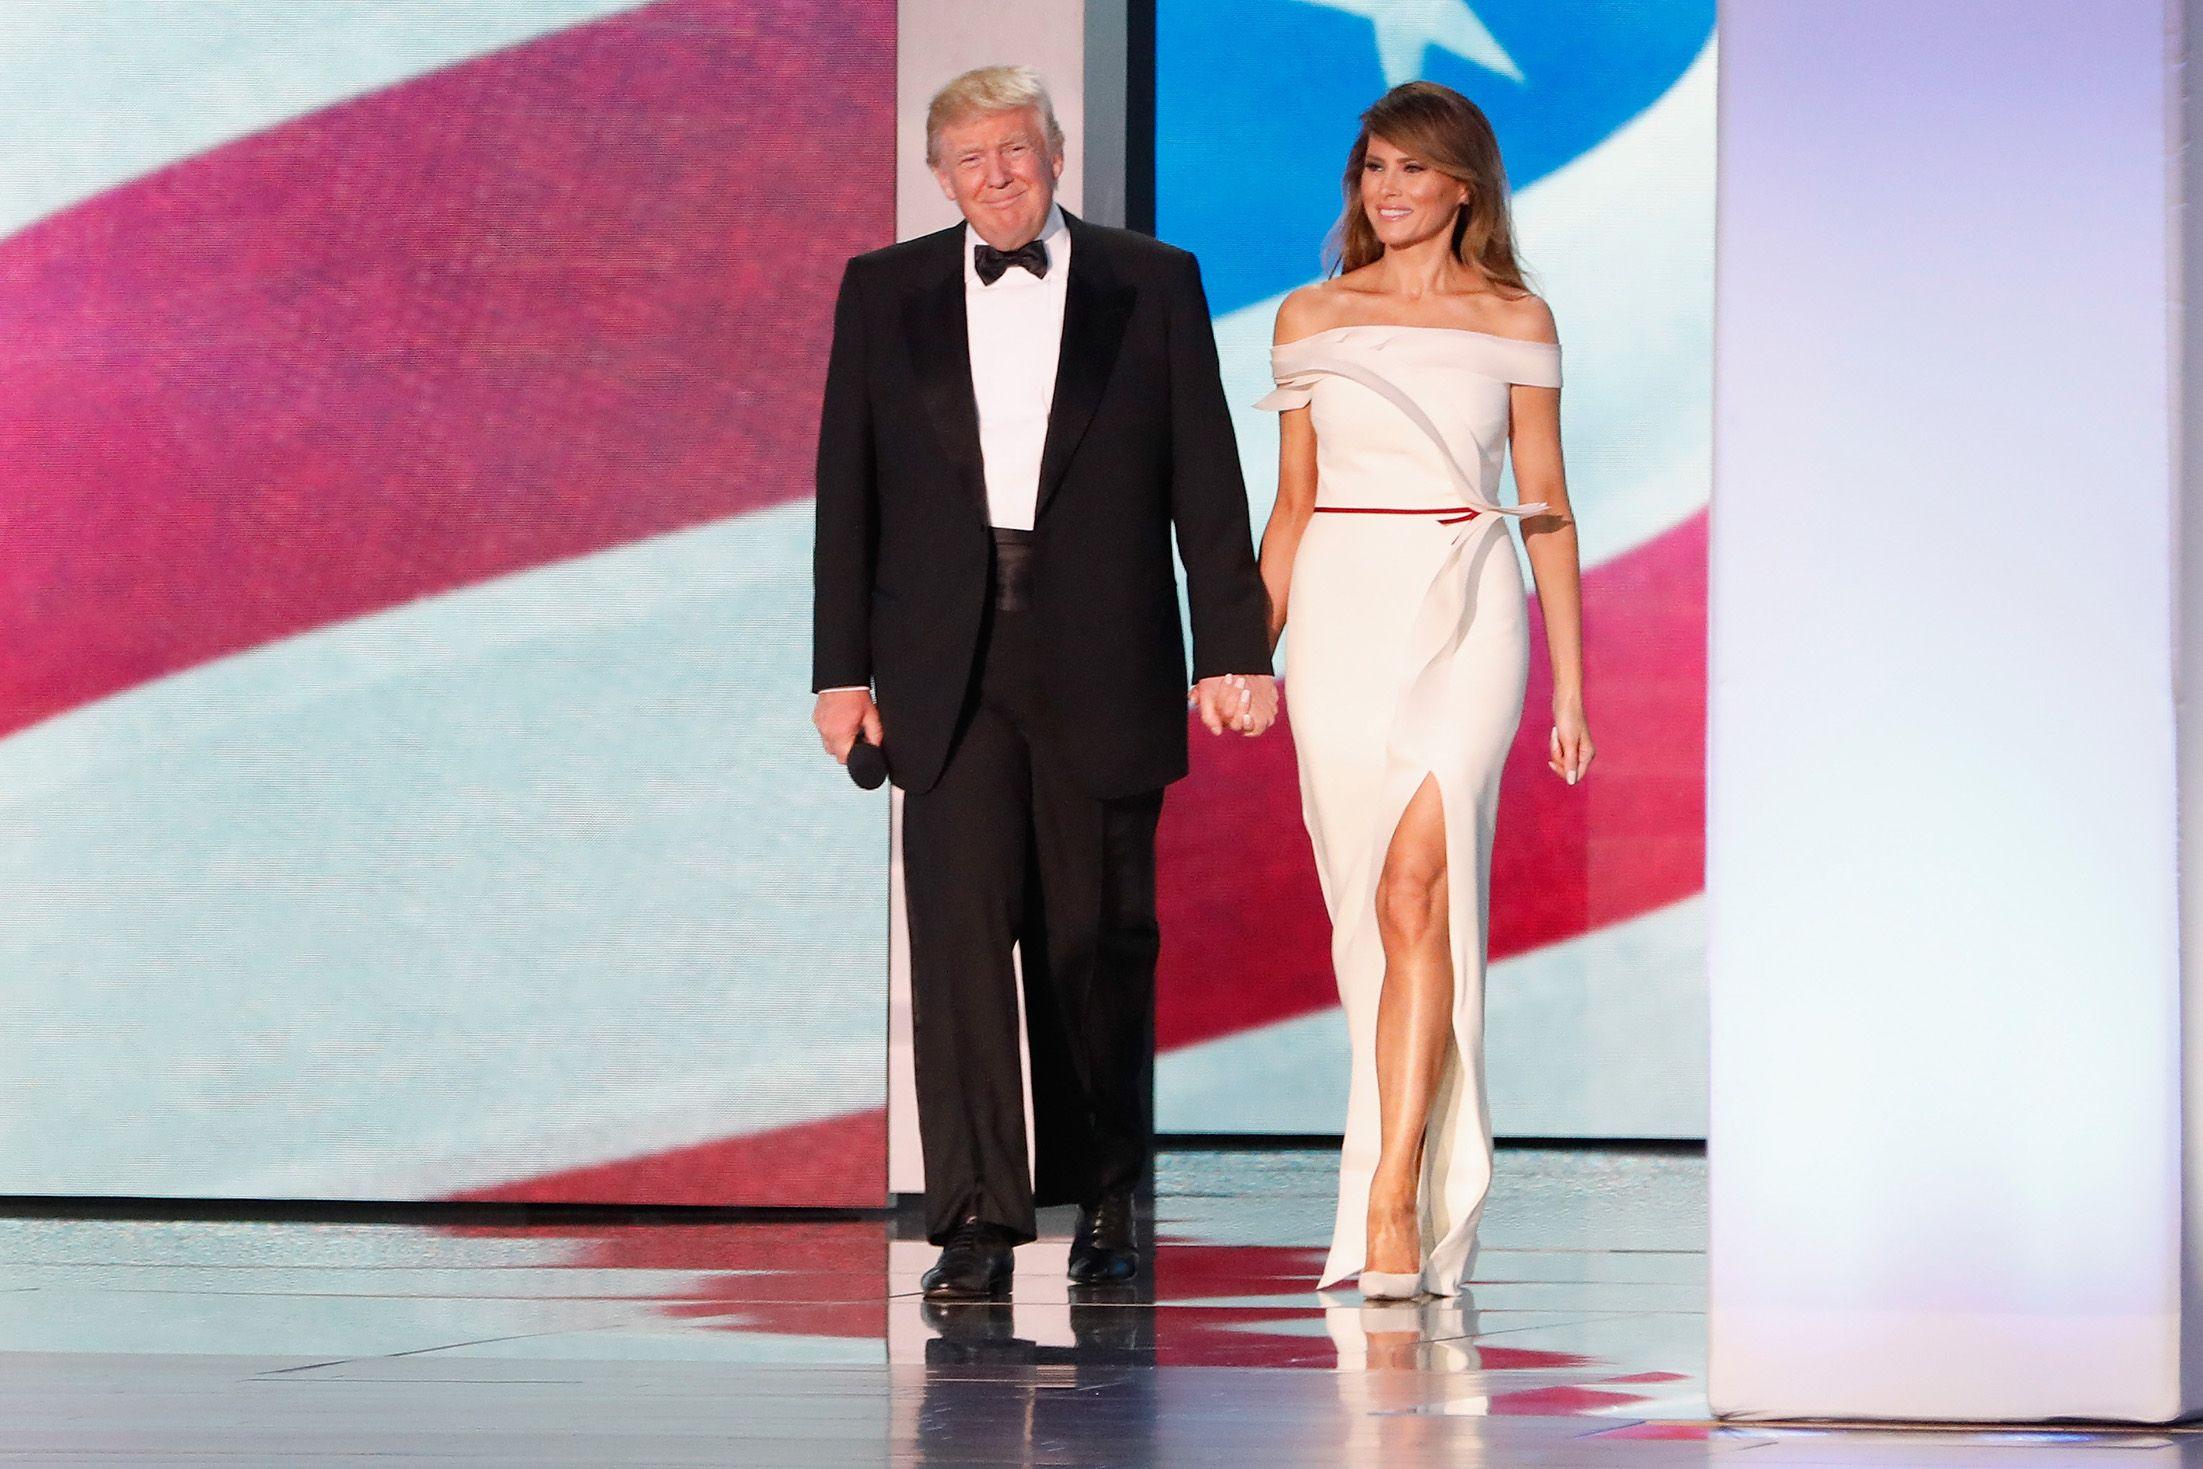 Melania Trump Inauguration Ball Outfit Meaning - Why Melania Trump ...